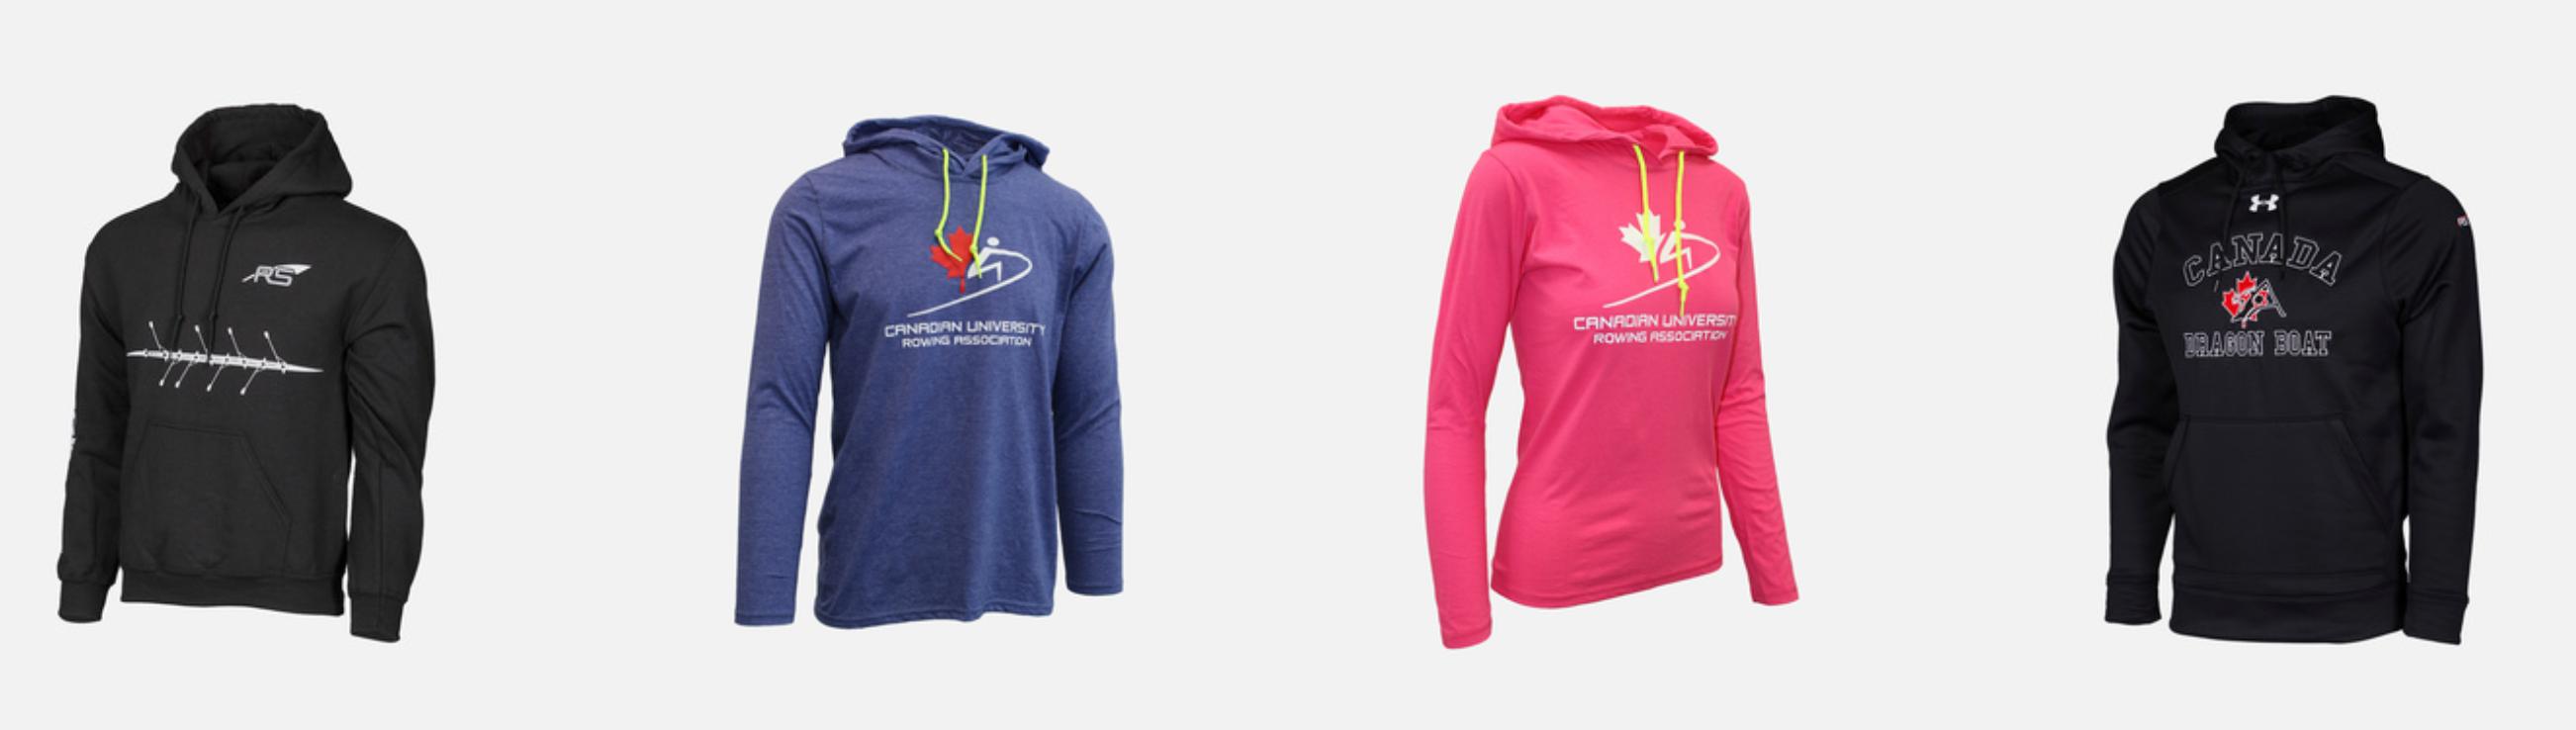 RegattaSport rowing hoodie designs